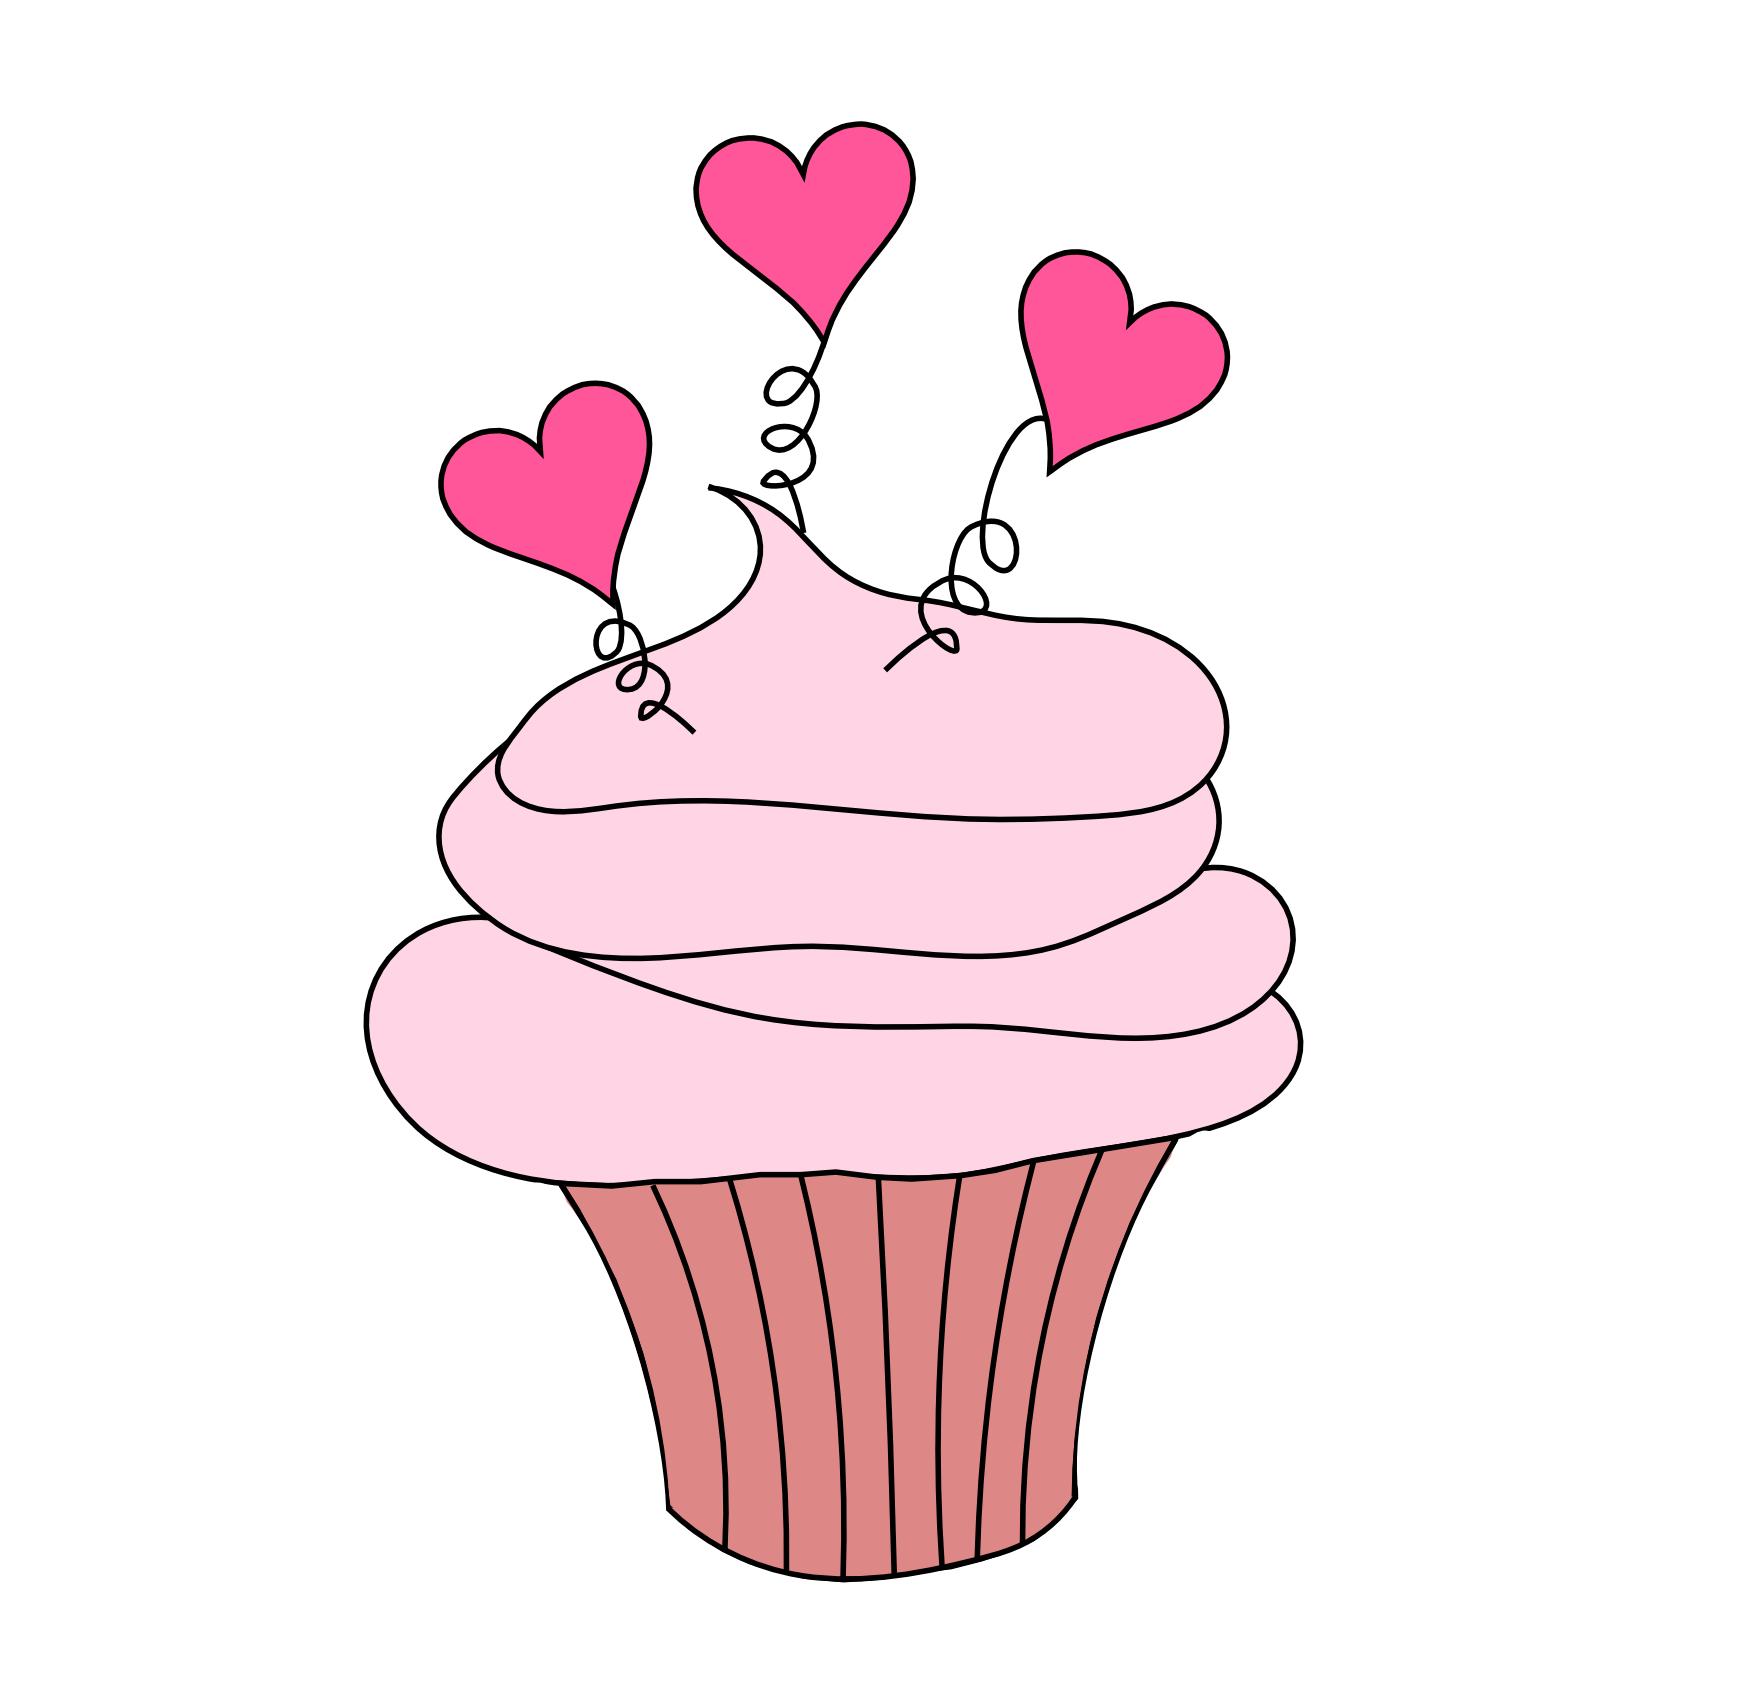 Valentine cupcakes clipart 4 » Clipart Portal.